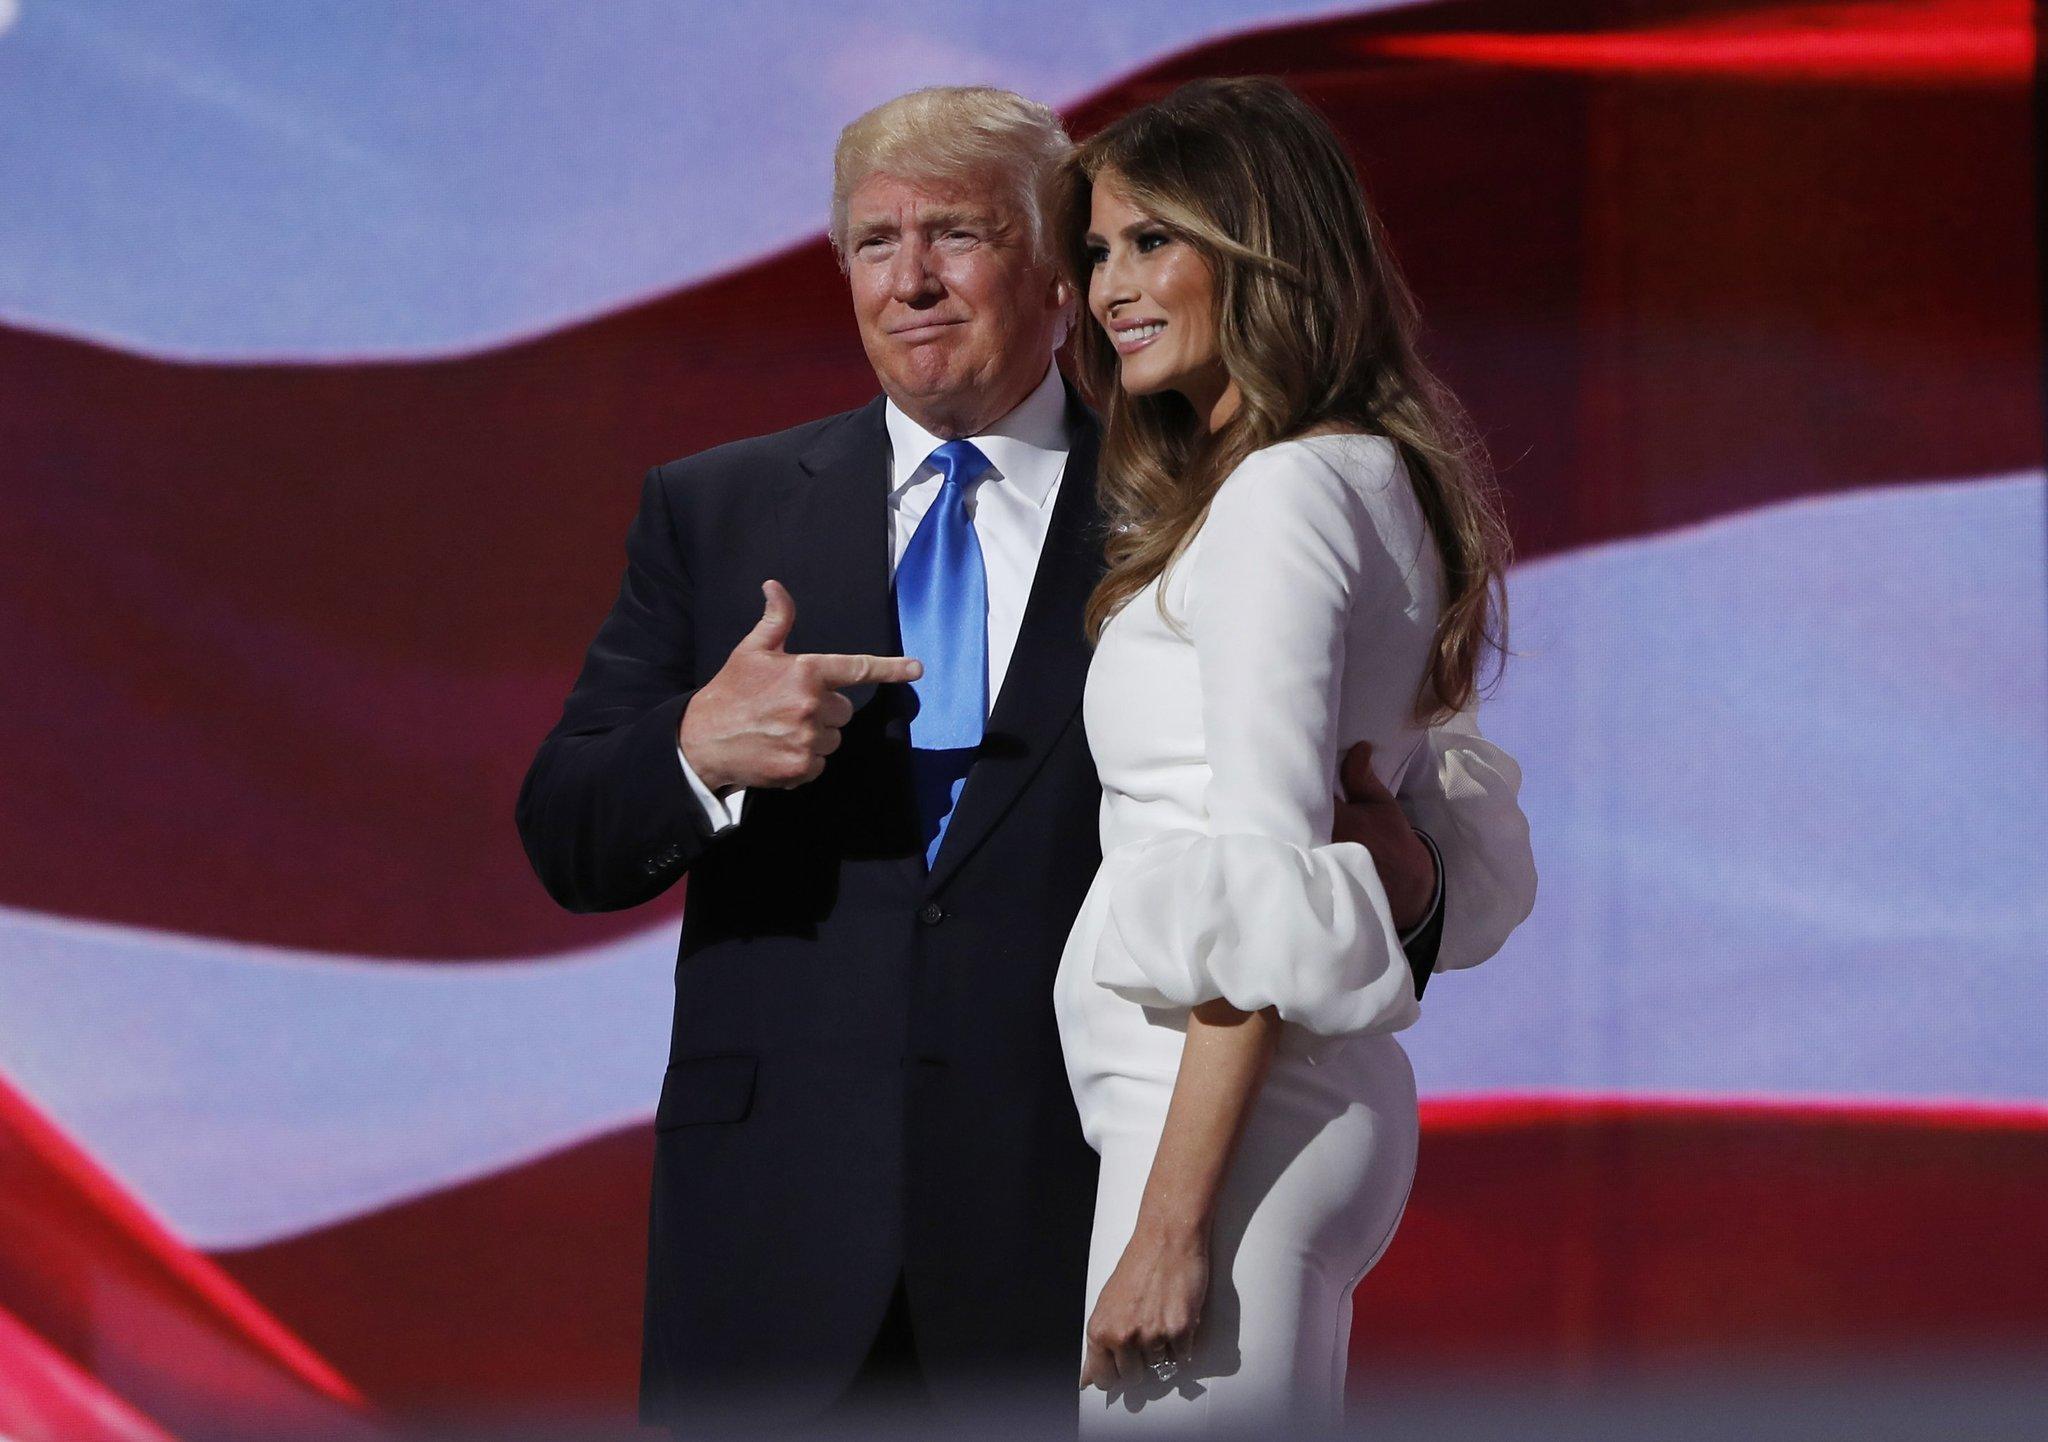 Melania Trumps Speech Sure Sounds Like Michelle Obamas The San